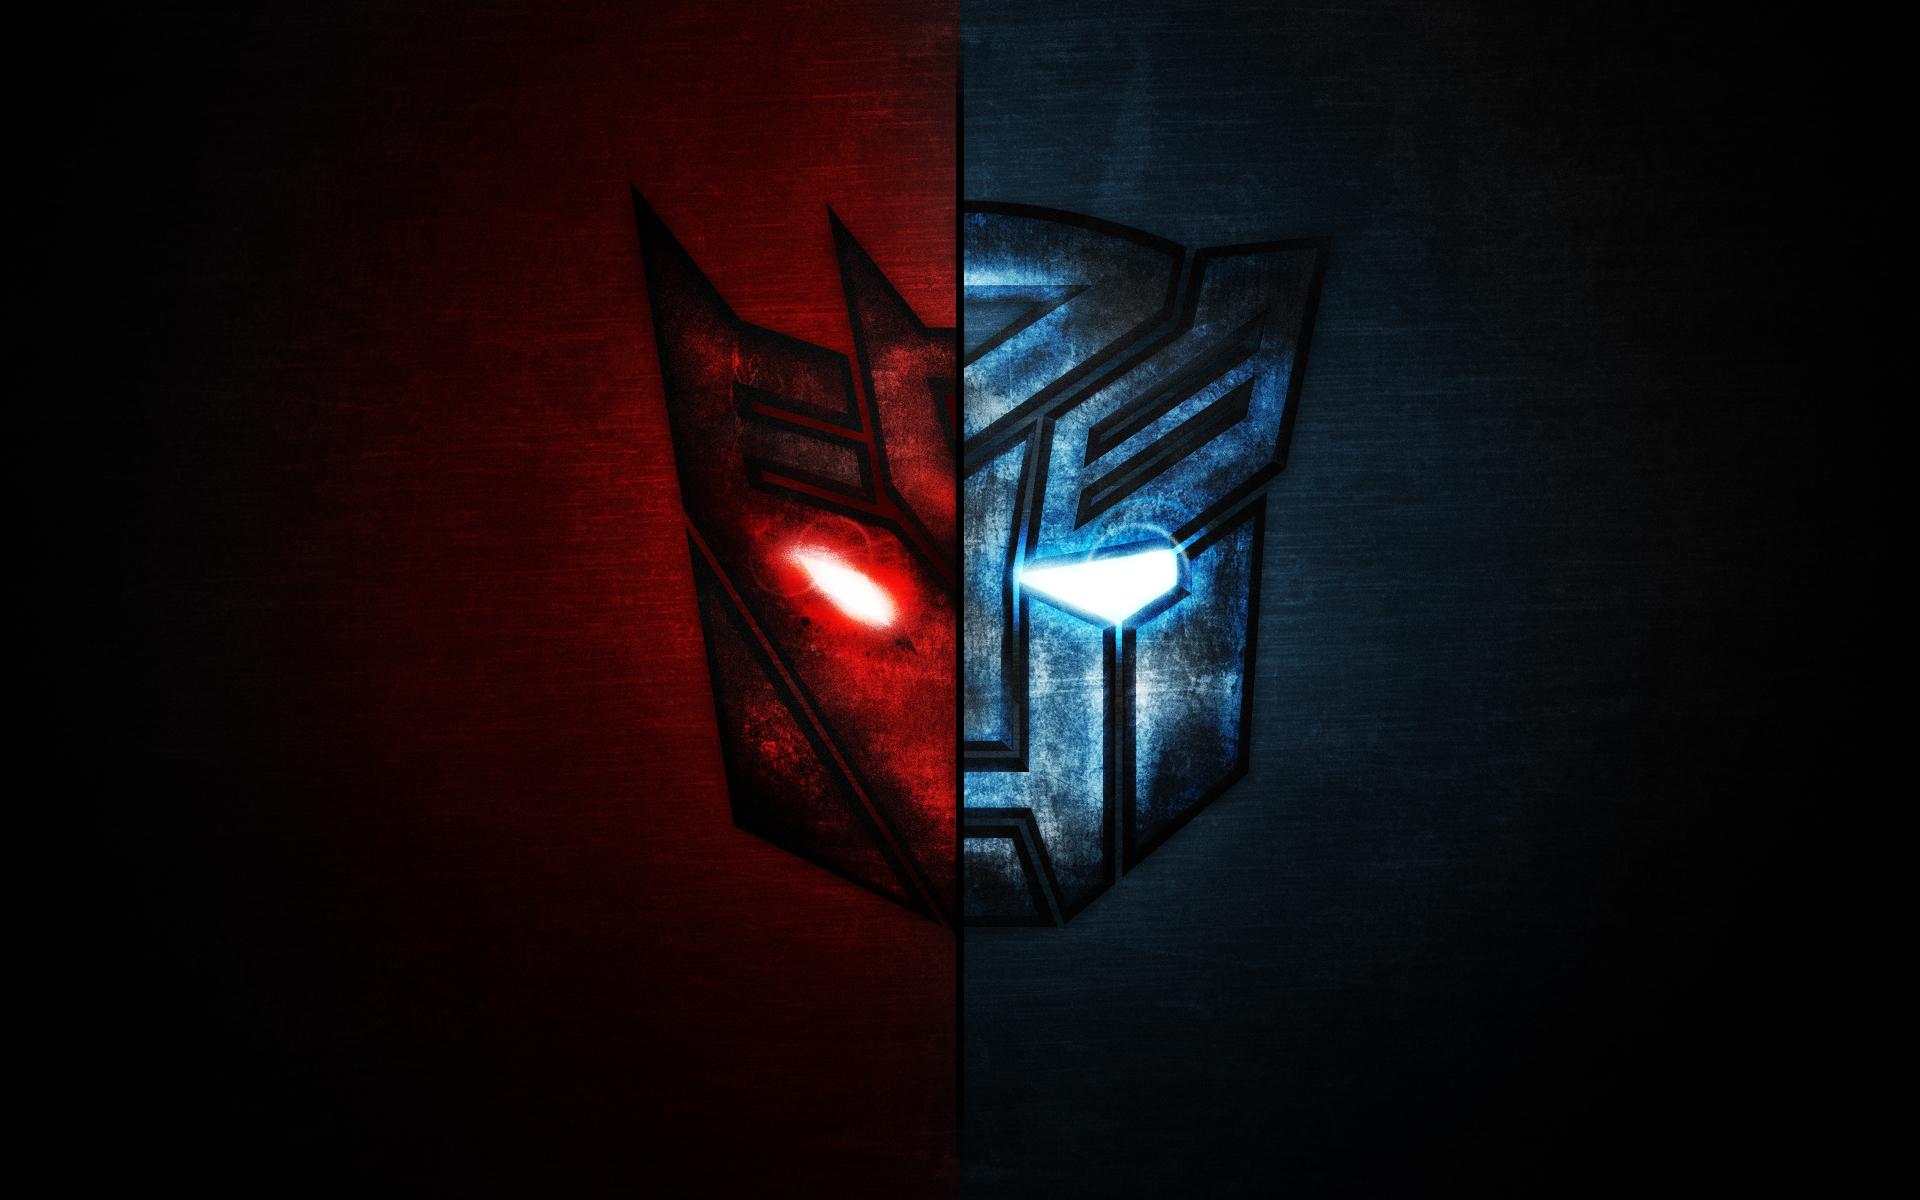 Transformers Wallpaper 5217 1920x1200 px HDWallSourcecom